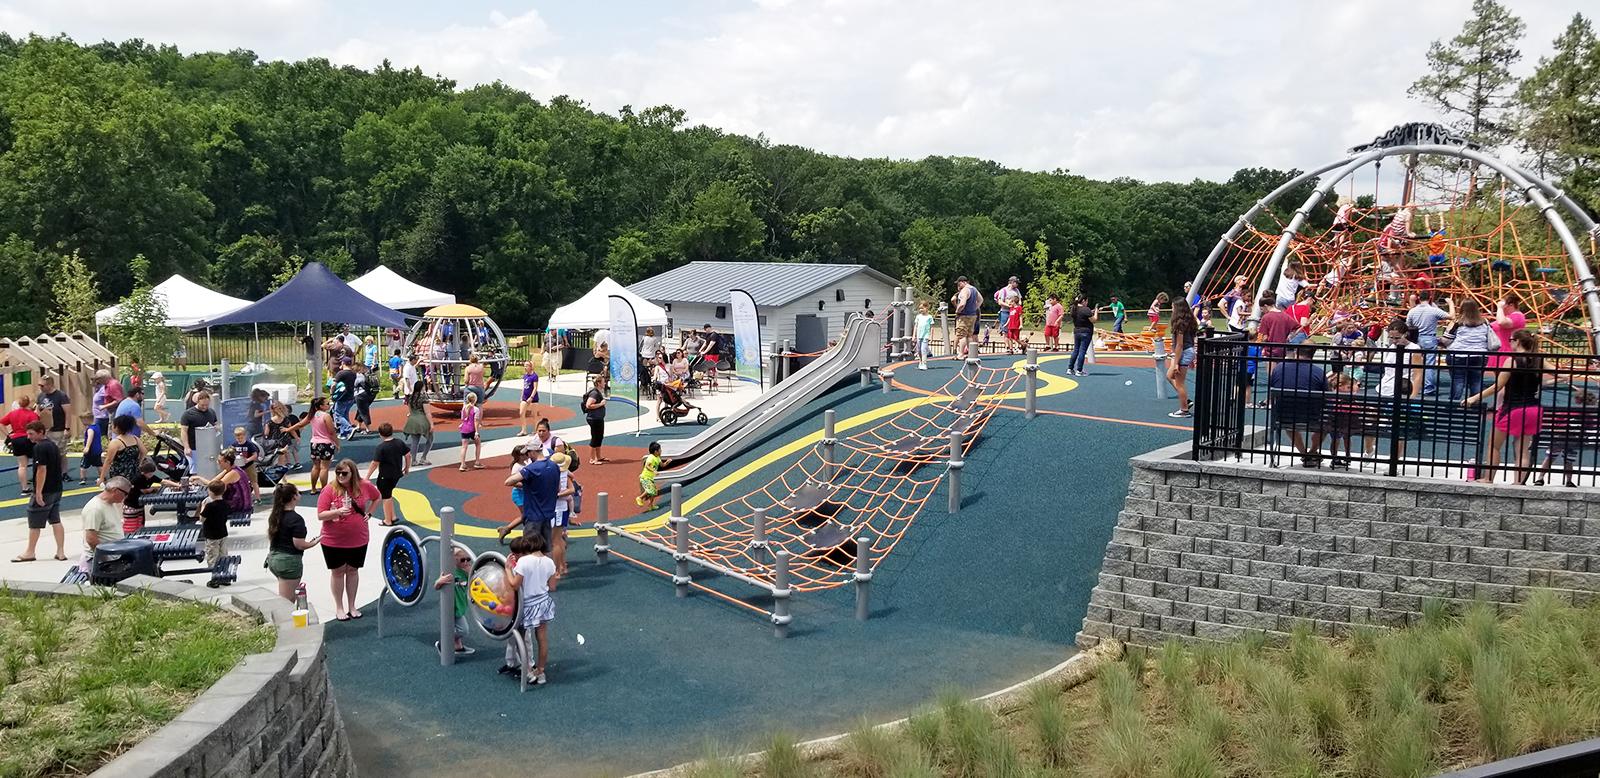 SMP Playground.jpg